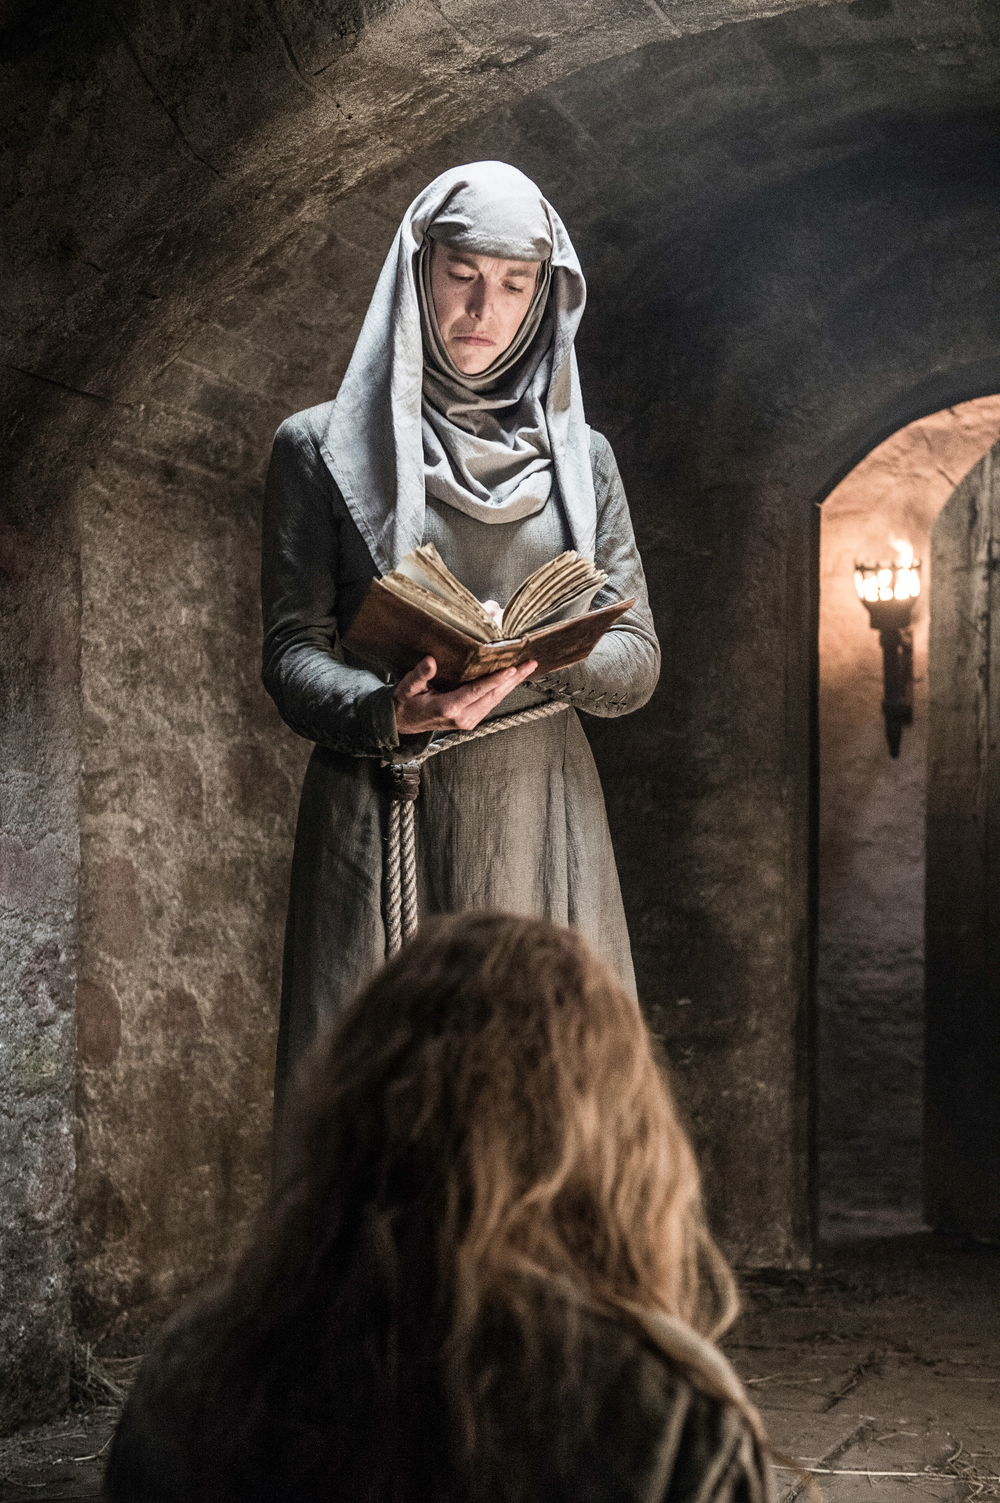 Natalie Dormer as Margaery Tyrell and Hannah Waddingham as Septa Unella